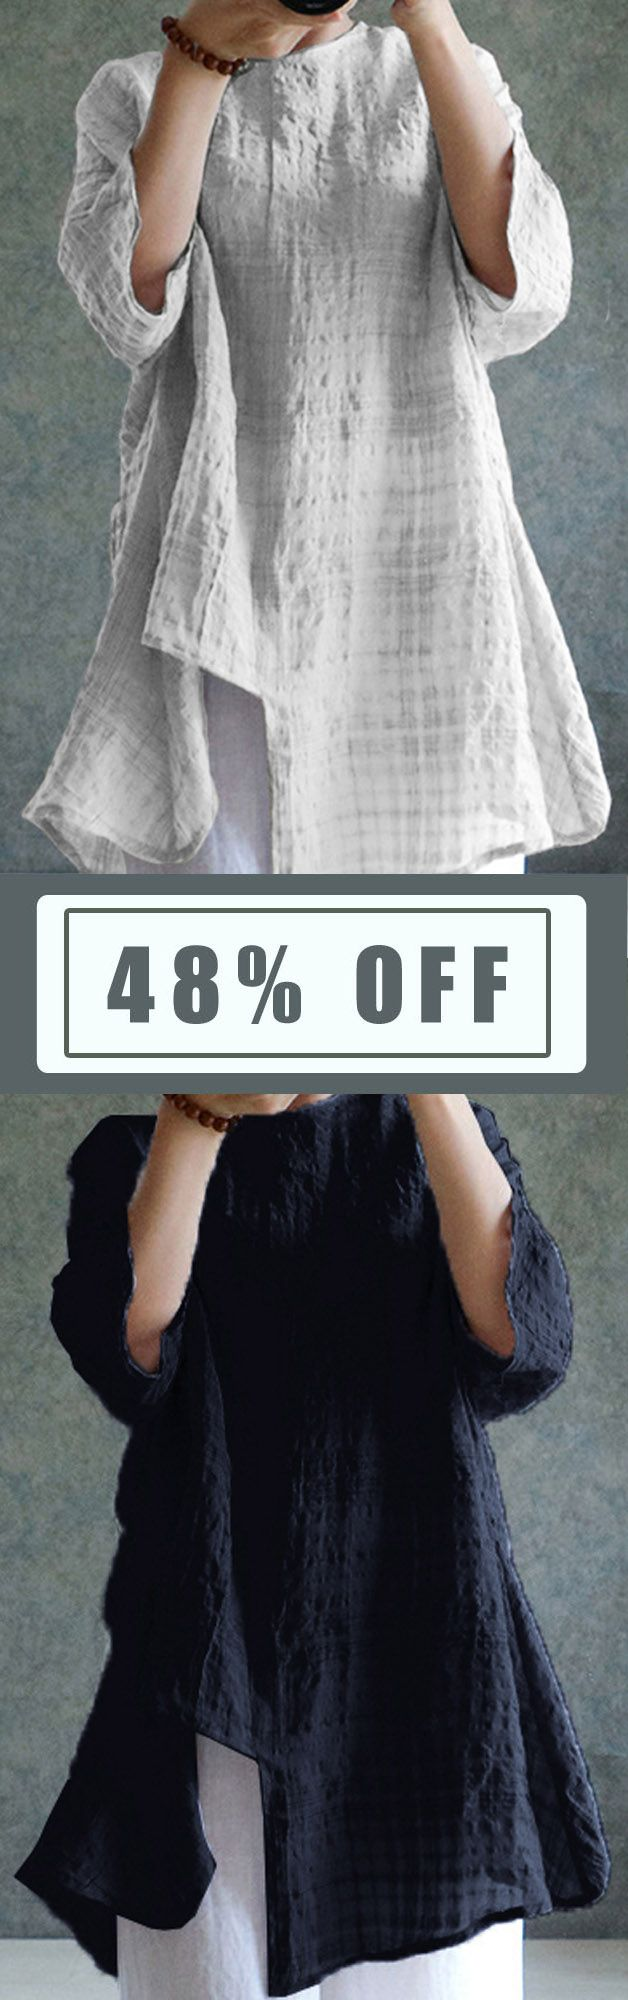 5 Colors Vintage Women Long Sleeve Plaid Asymmetrical Blouse. Brief Style, Vintage Style, Casual Style, Loose Style, Long Sleeve, O-Neck. Color:Navy,White,Army Green,Beige,Burgundy. Size:S,L,XL,XXL,XXXL,XXXXL,5XL. Buy now!  #women #blouse #fashion